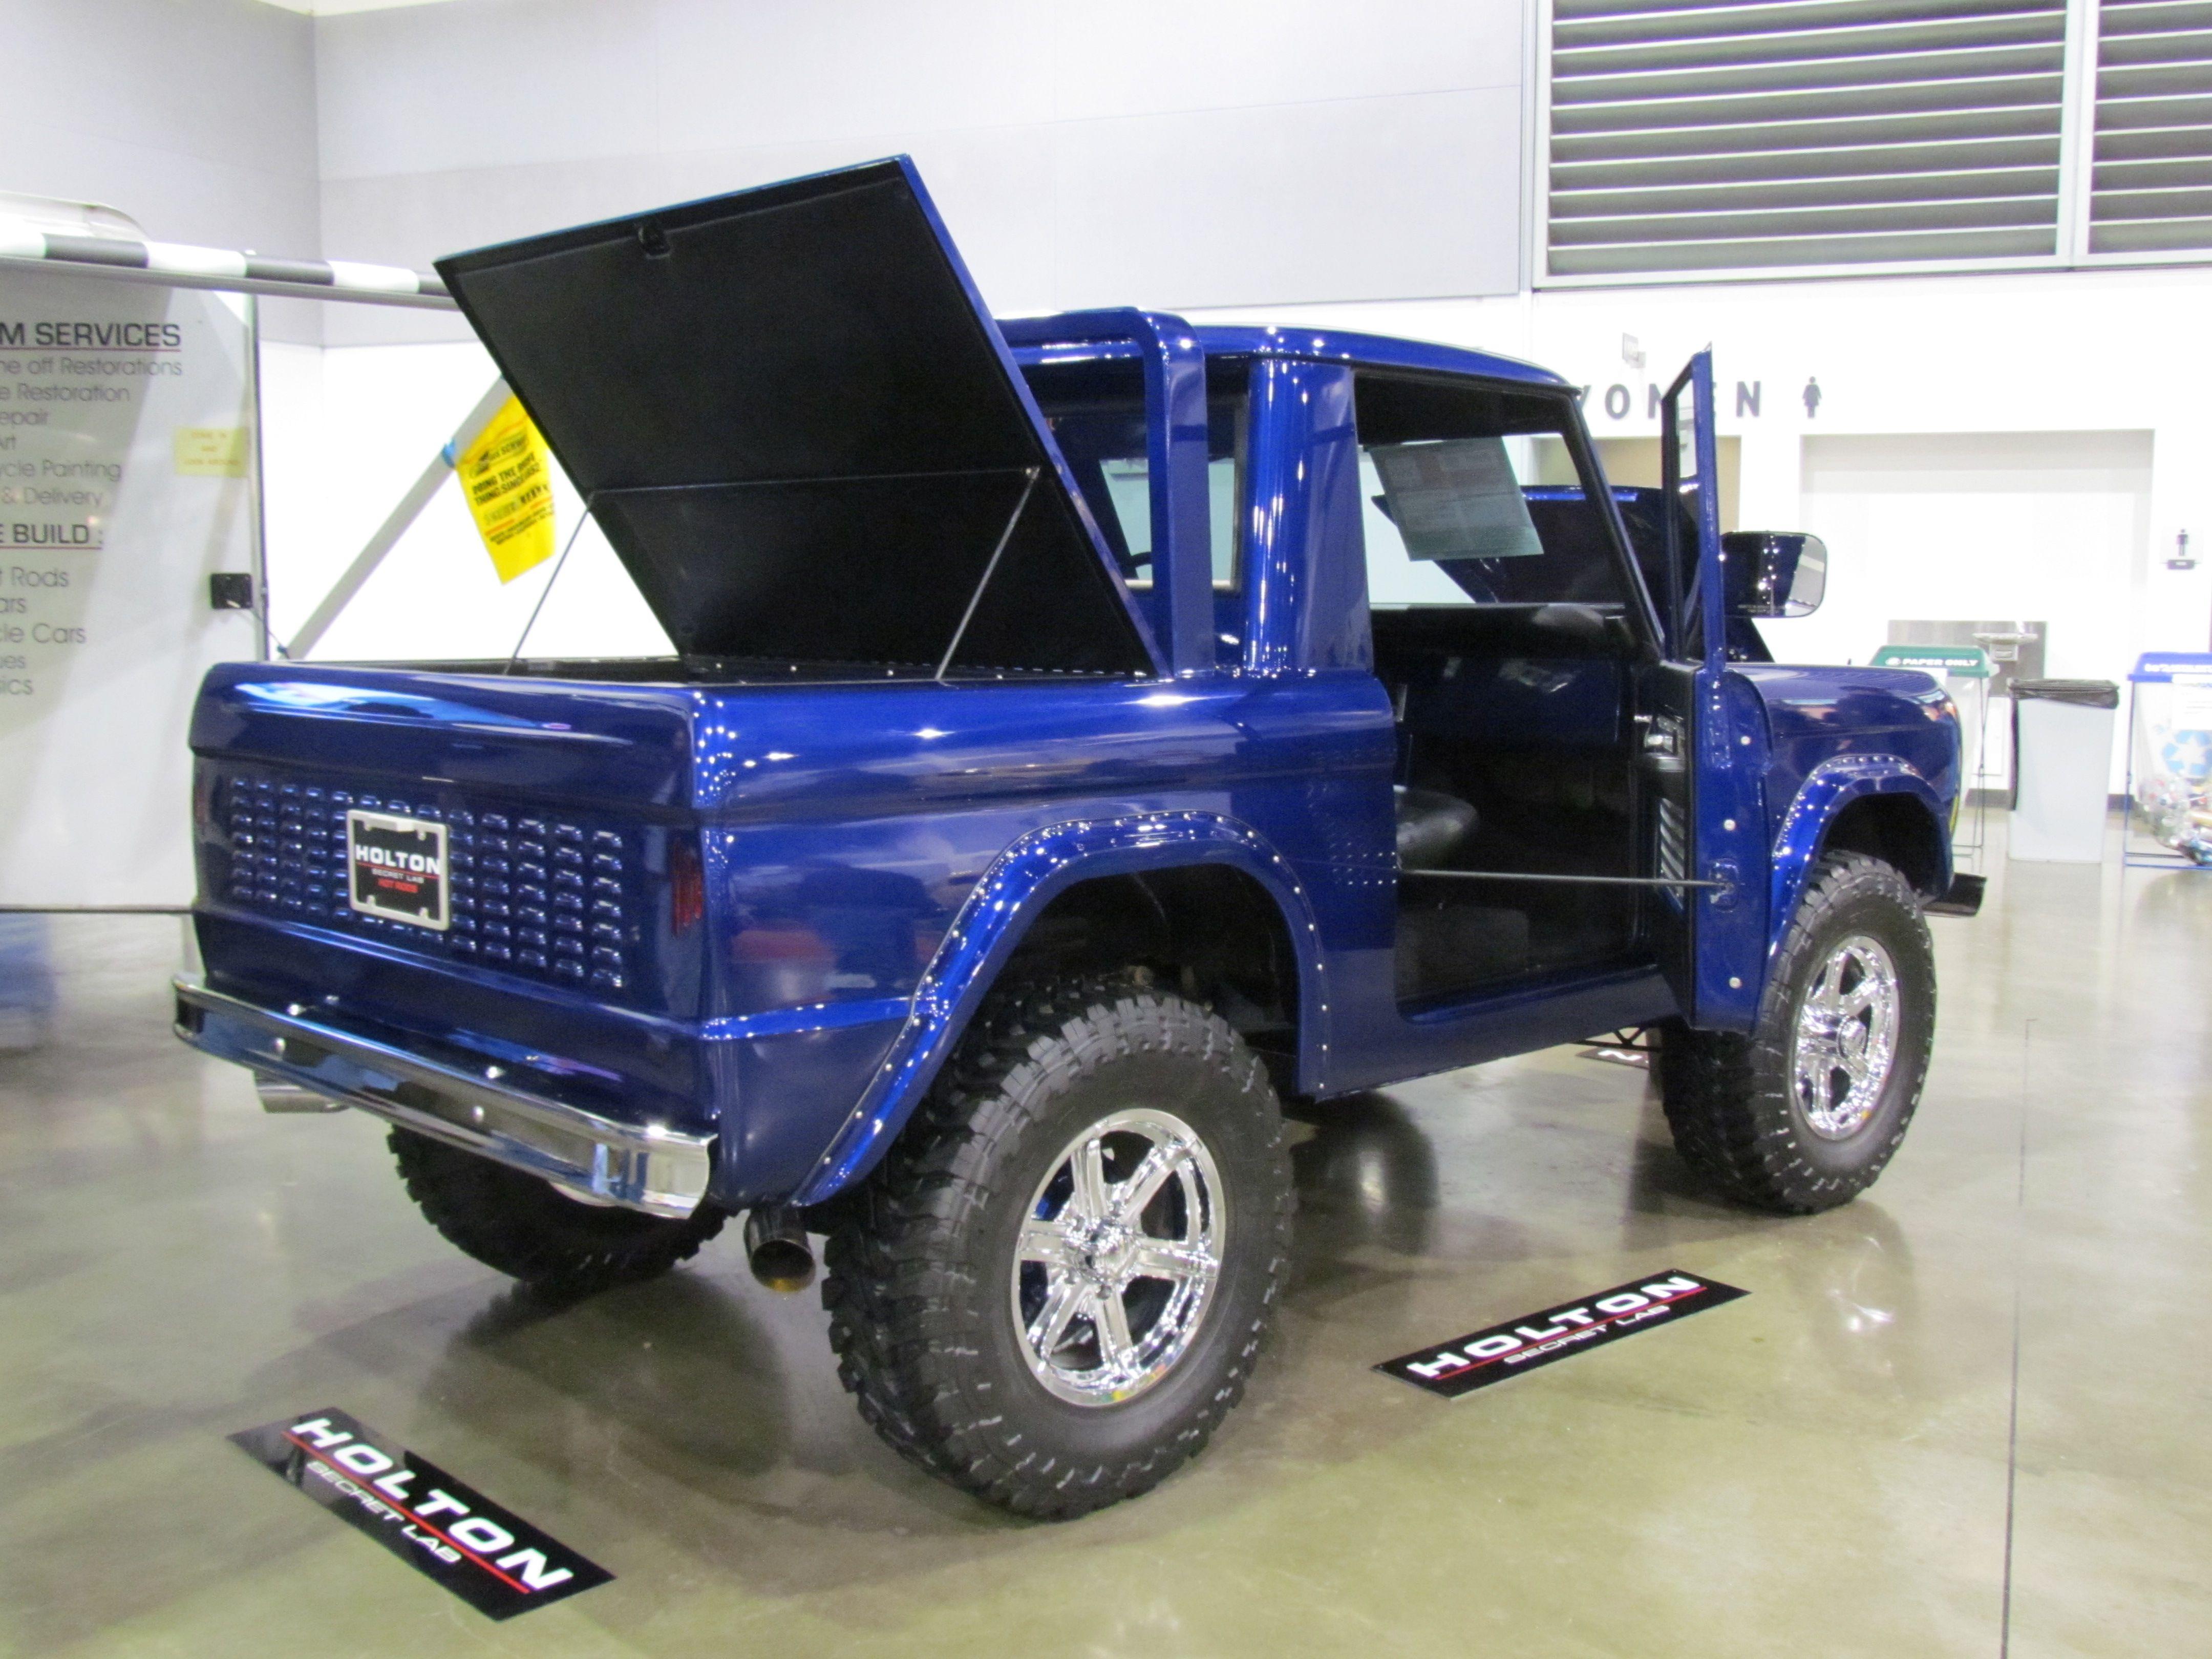 1995 Ford Bronco Suv Consumer Reviews